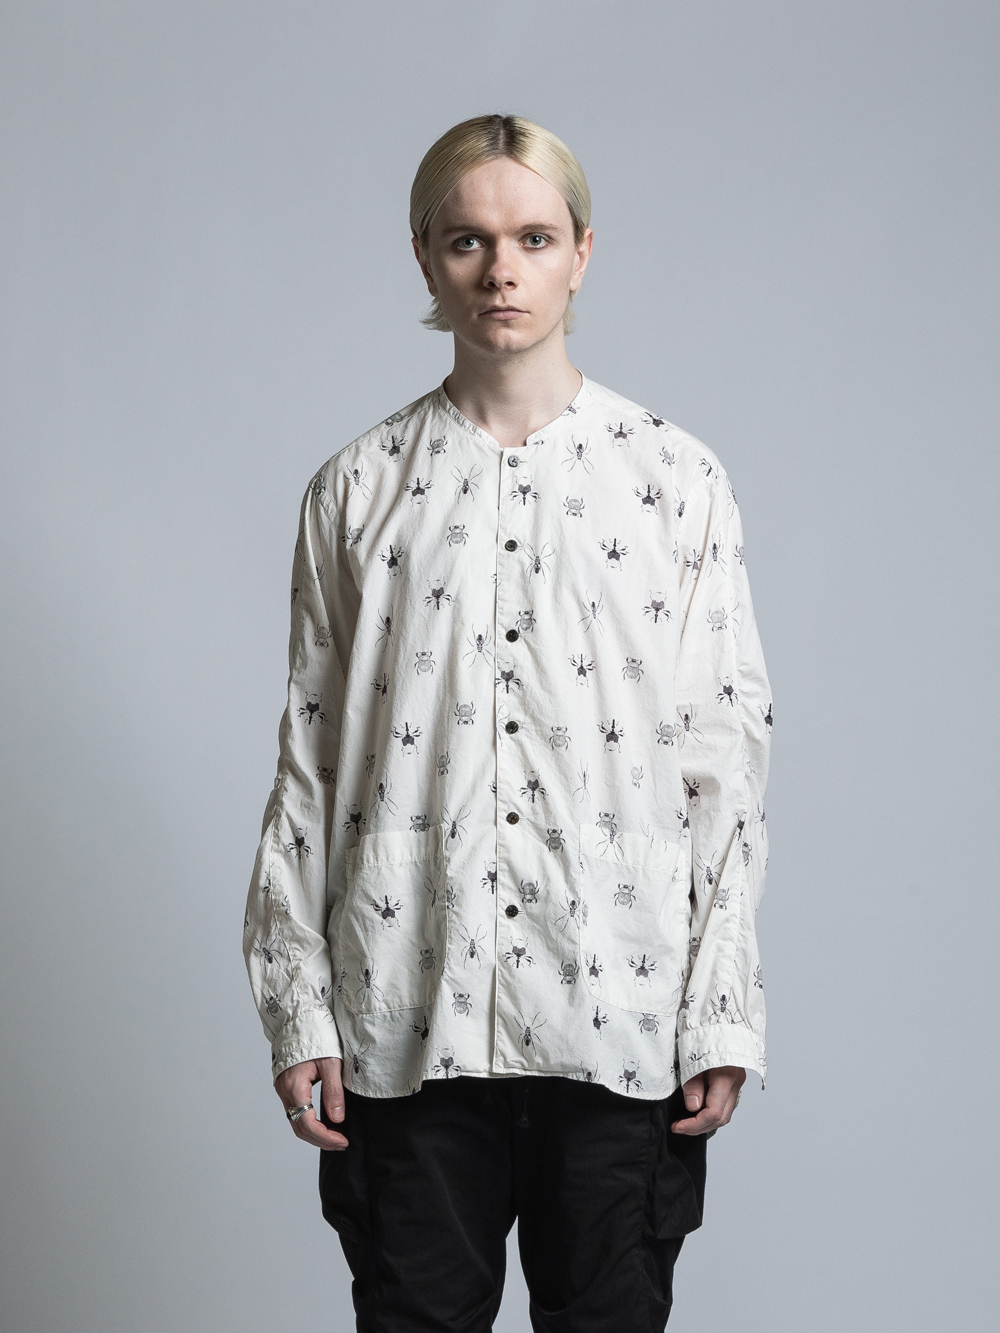 VI-3335-02 / 桃山鈴子氏コラボレーション 虫プリント裾ポケット長袖シャツ